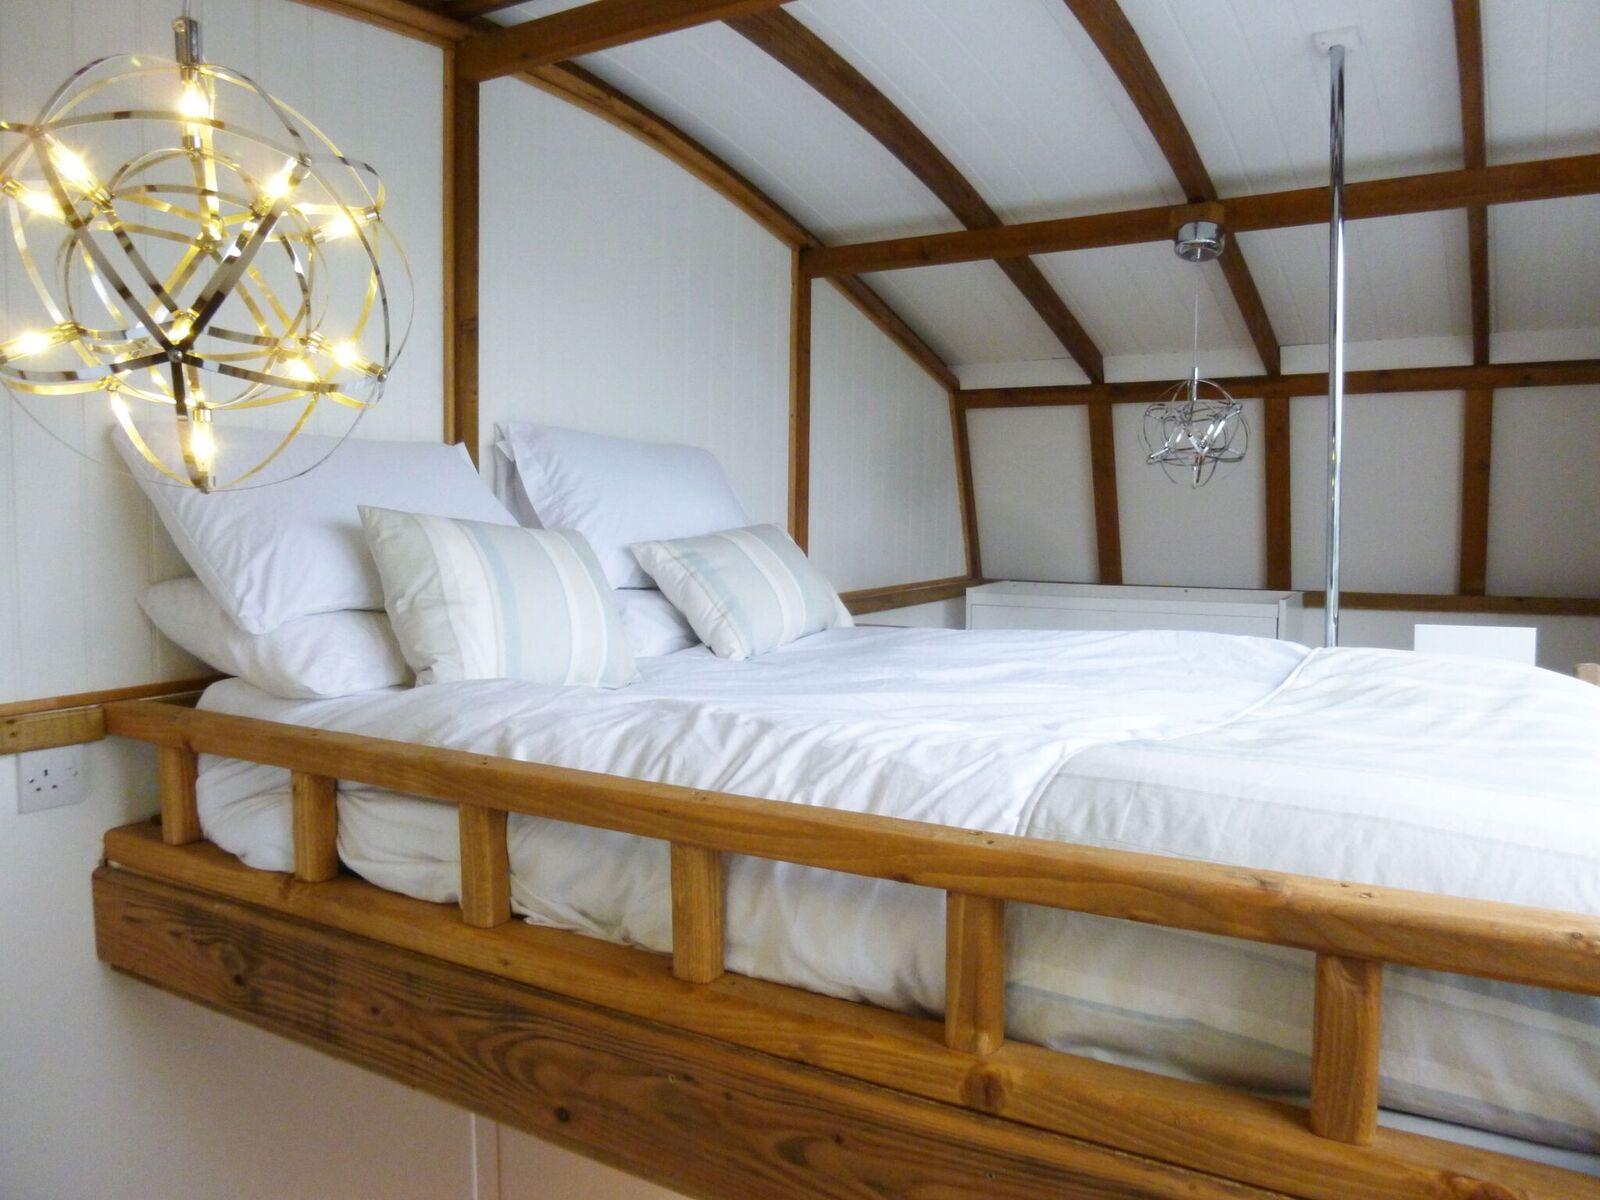 the-lumber-loft-11